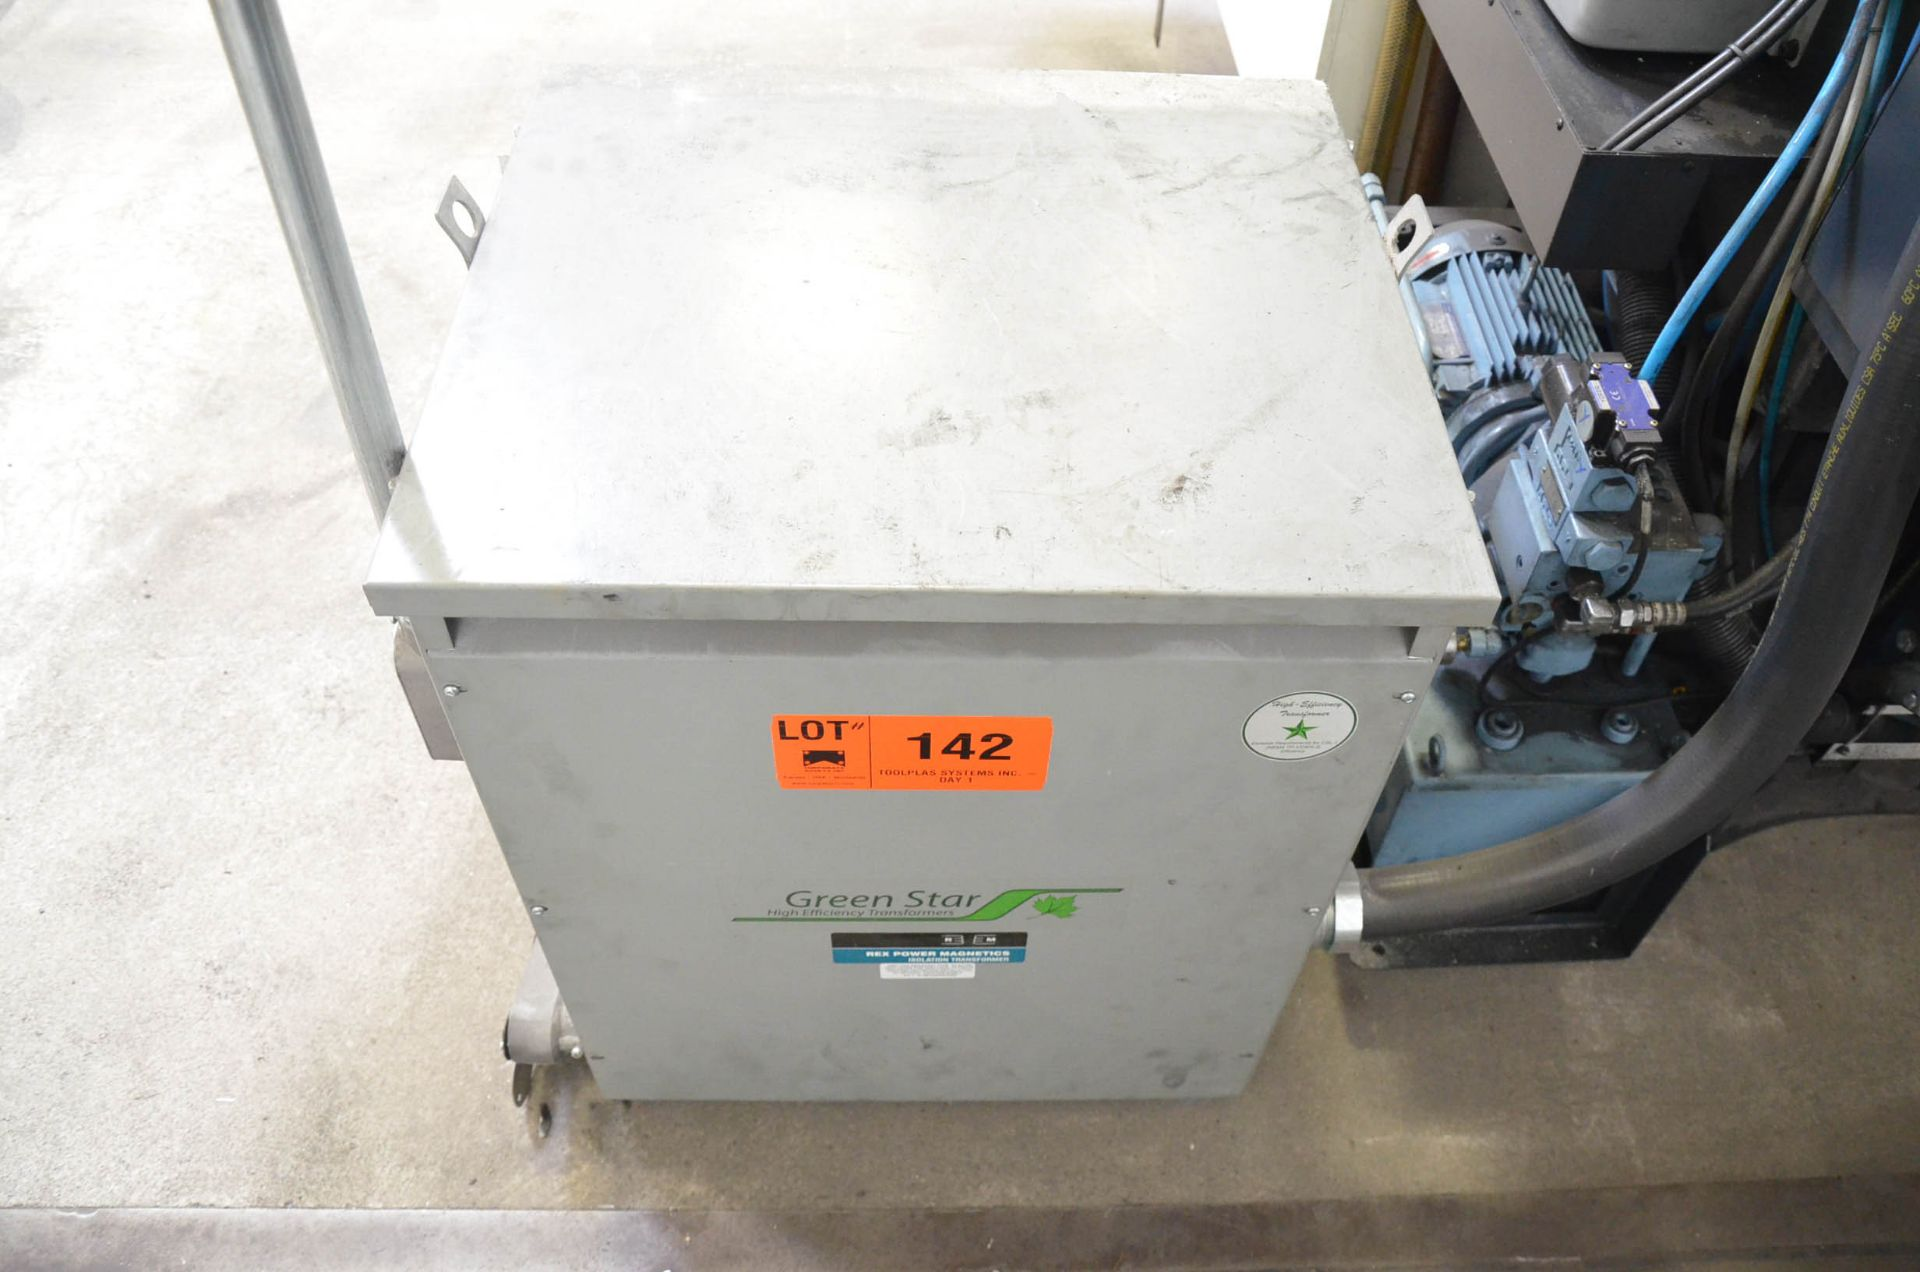 REX 75KVA/600-208V/3PH/60HZ TRANSFORMER (CI) [RIGGING FEES FOR LOT #142 - $50 USD PLUS APPLICABLE